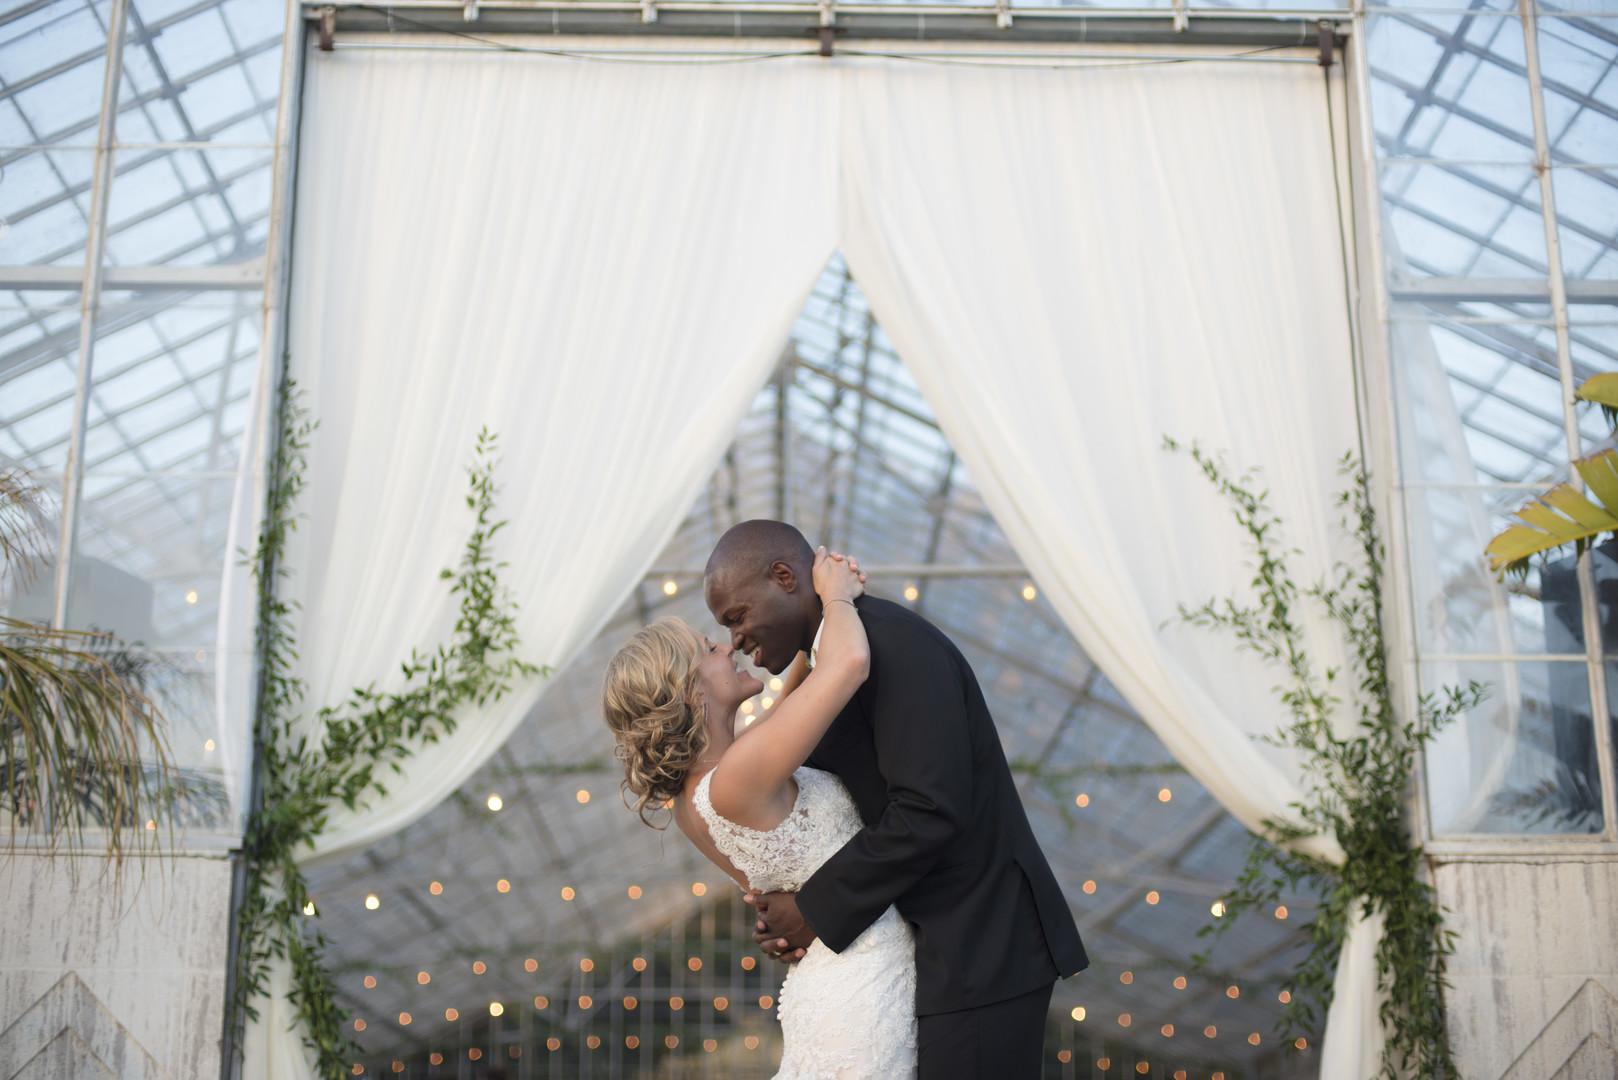 www.santabarbarawedding.com | Venue: Dos Pueblos Ranch | Photographer: ByCherry Photography | Event Designer: Elan Event Rentals | Bride and Groom Kiss at Reception Site